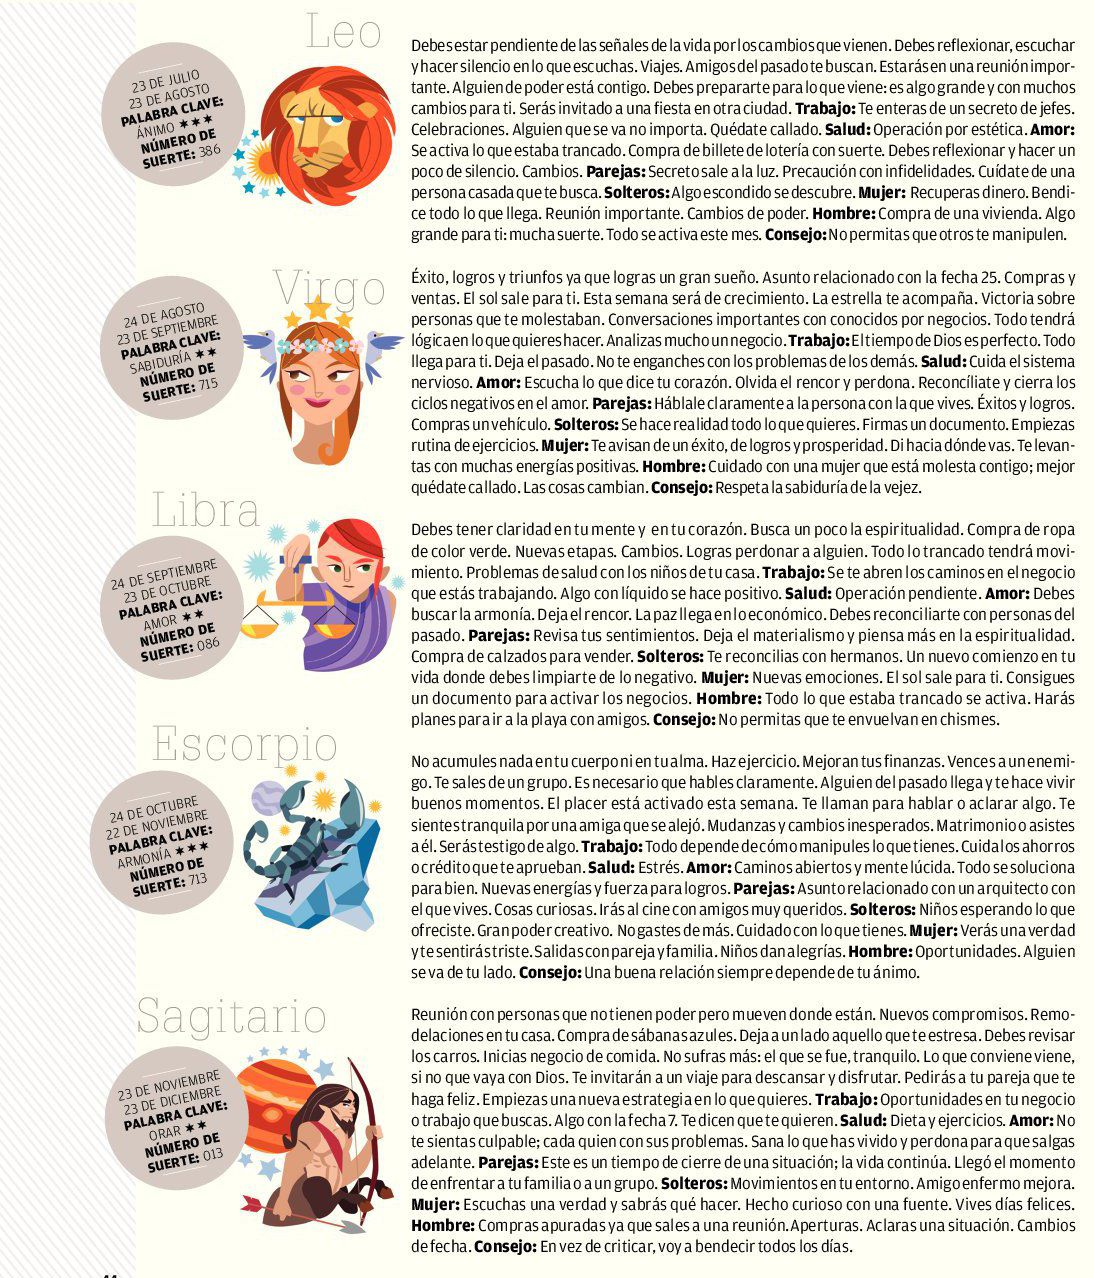 20130811 TODO1 44 1 G1 Horóscopo por Adriana Azzi Sedes